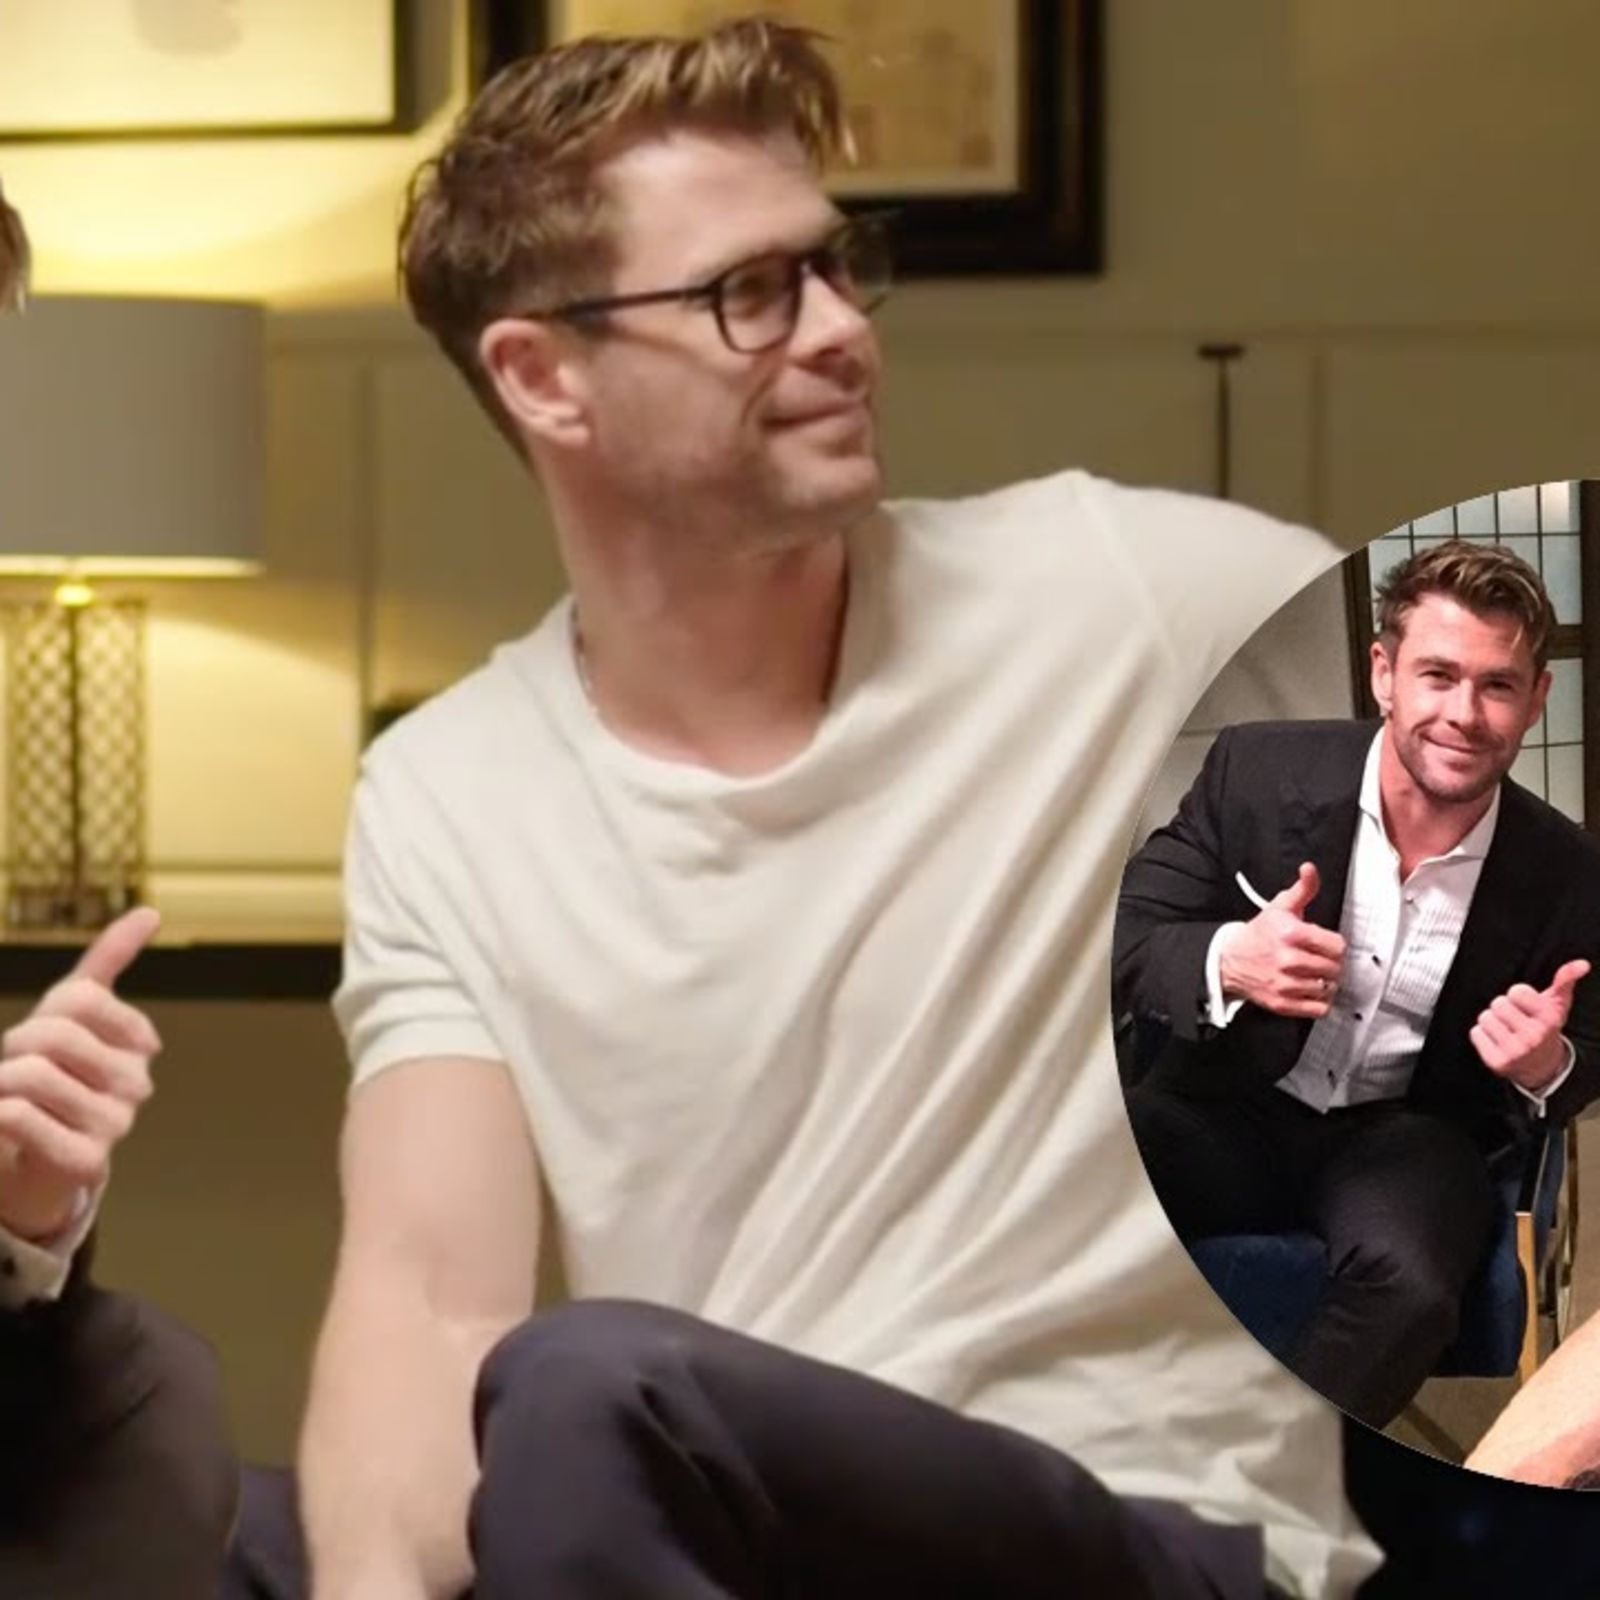 Chris Hemsworth interviews Chris Hemsworth about Chris Hemsworth